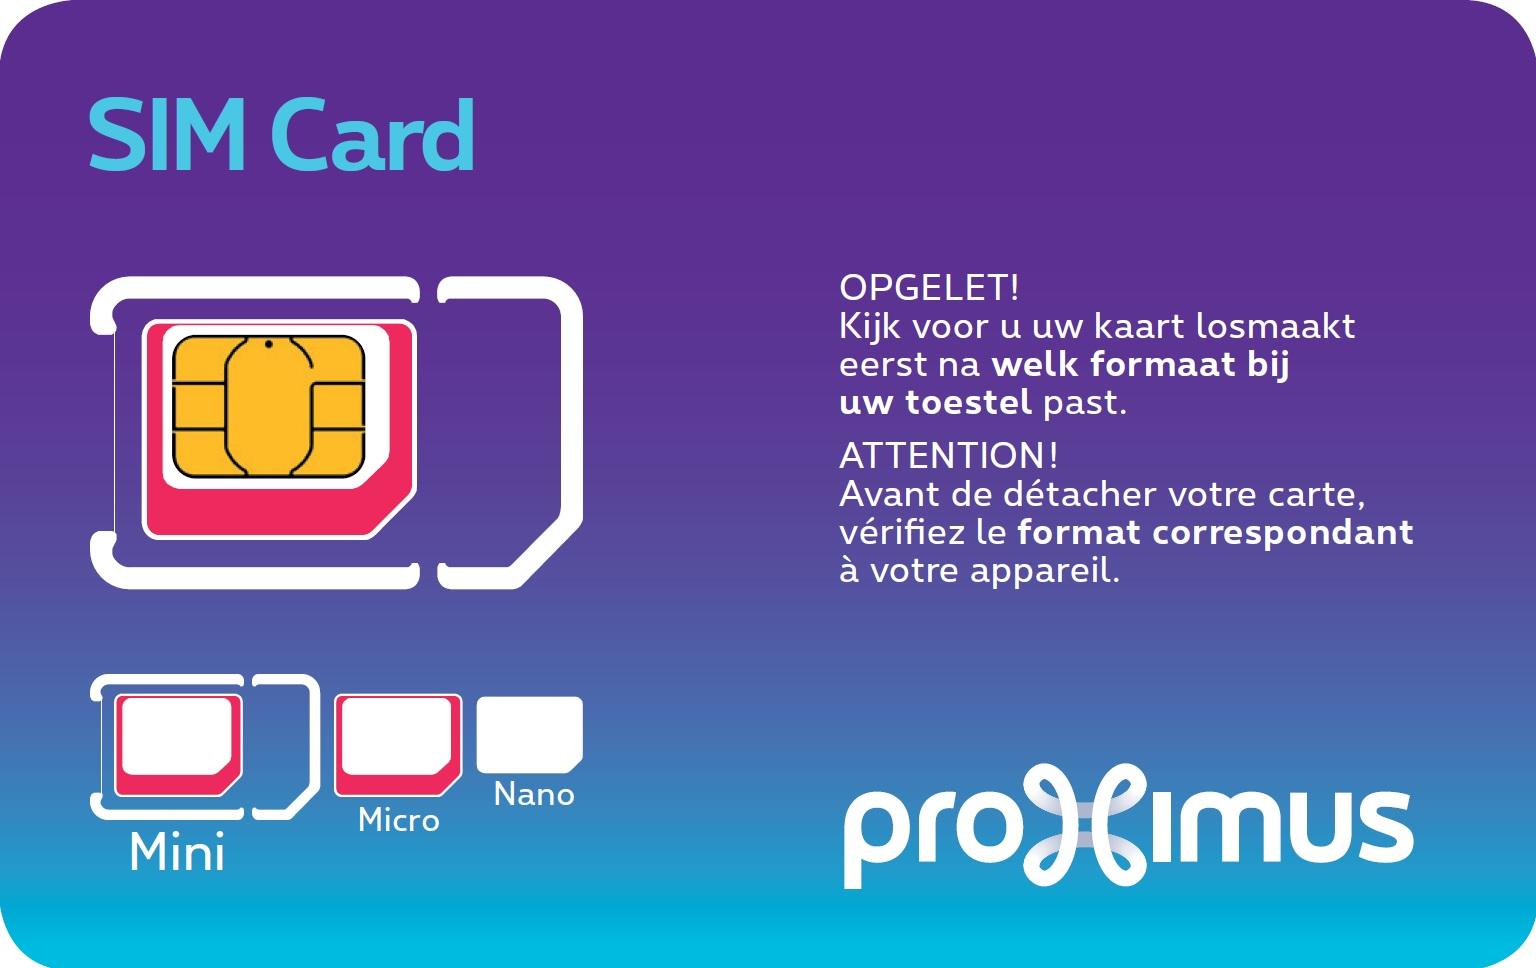 Choisir ou changer votre carte sim proximus - Couper une micro sim en nano sim ...